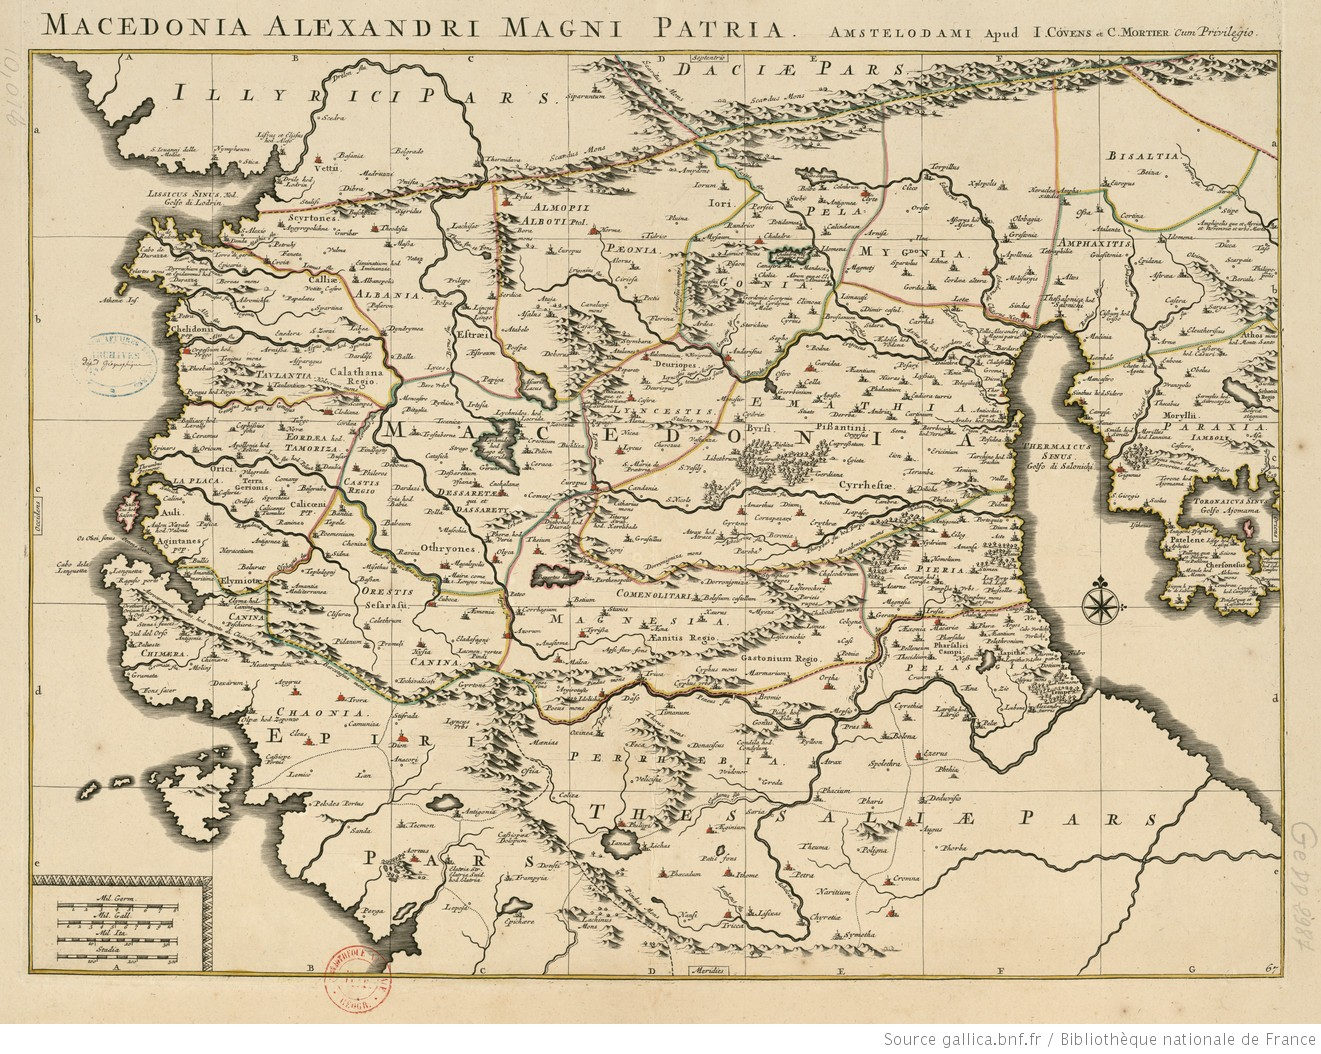 Macedonia Alexandri Magni patria / [I. Laurenbergio] - 1